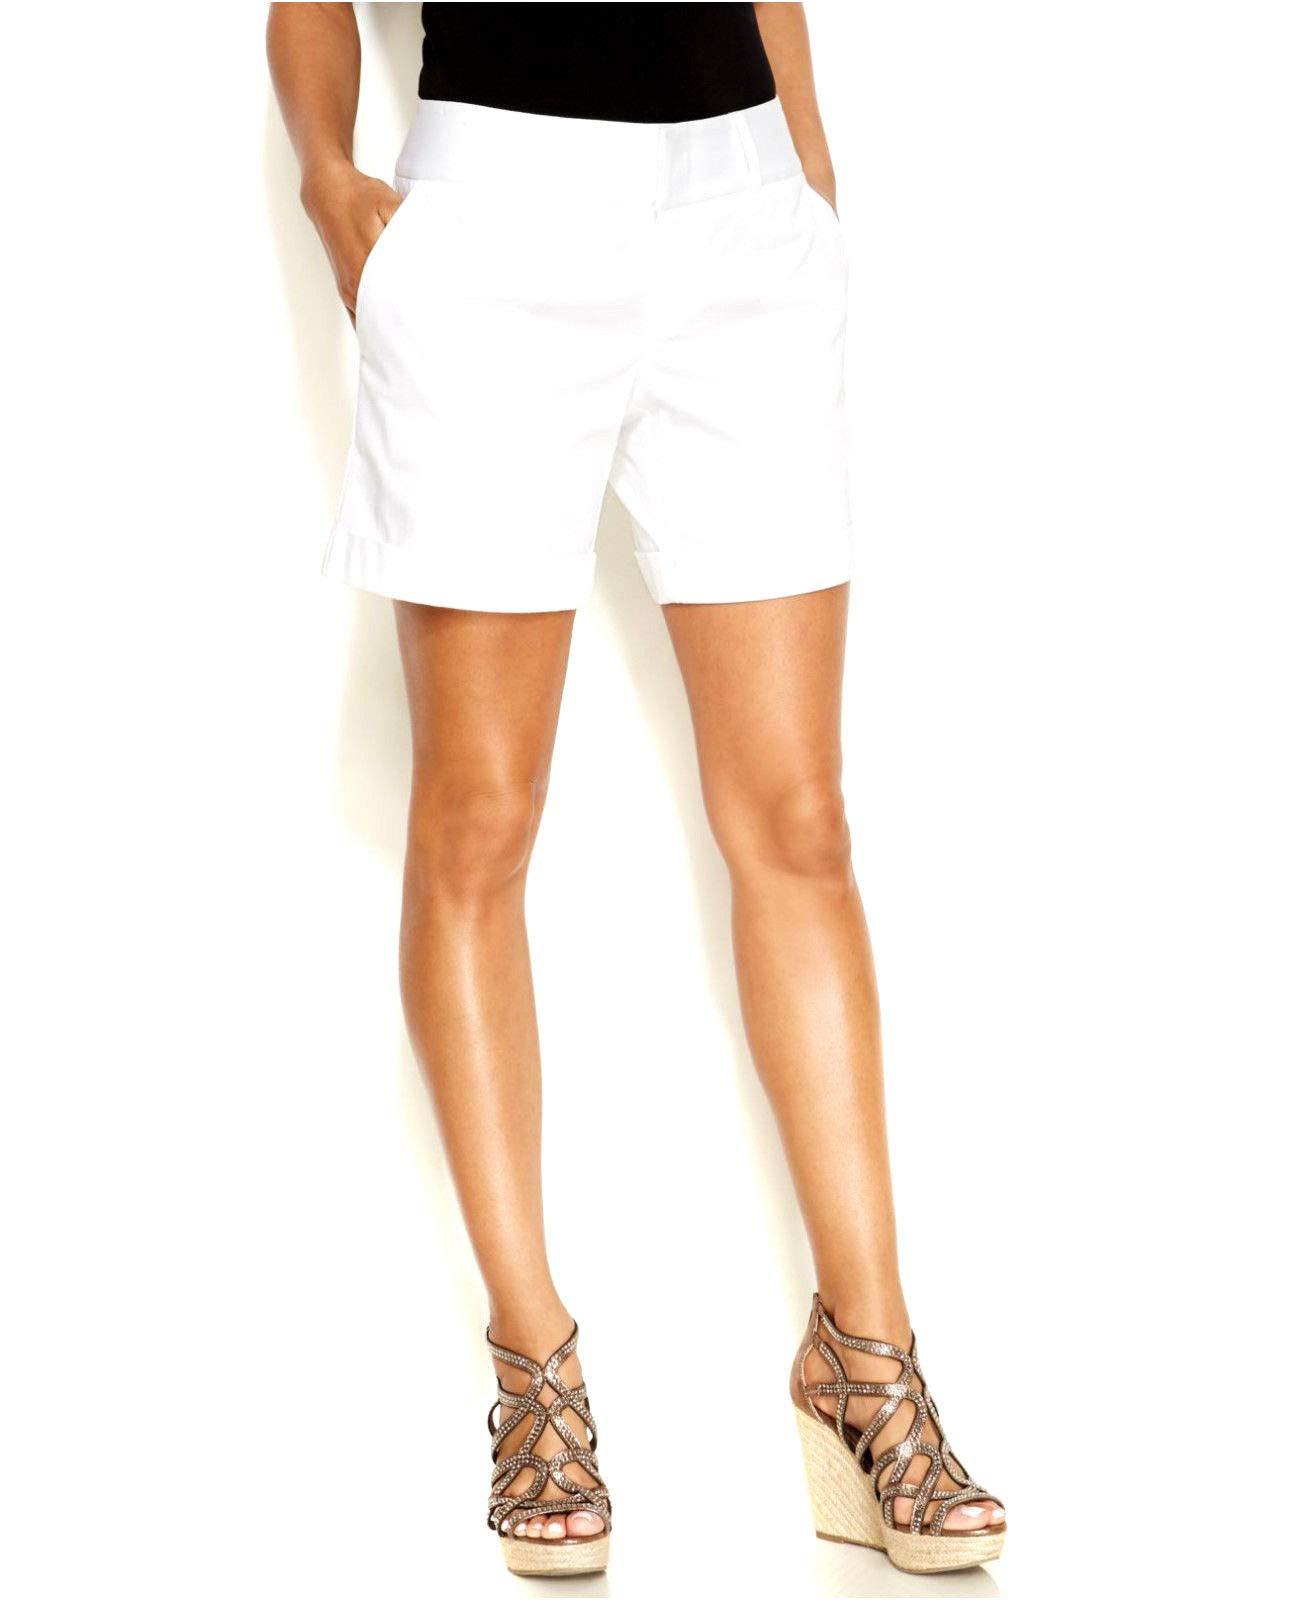 INC International Concepts Twill Cuff Shorts Sleek Tailored Fit Size 16 Petites